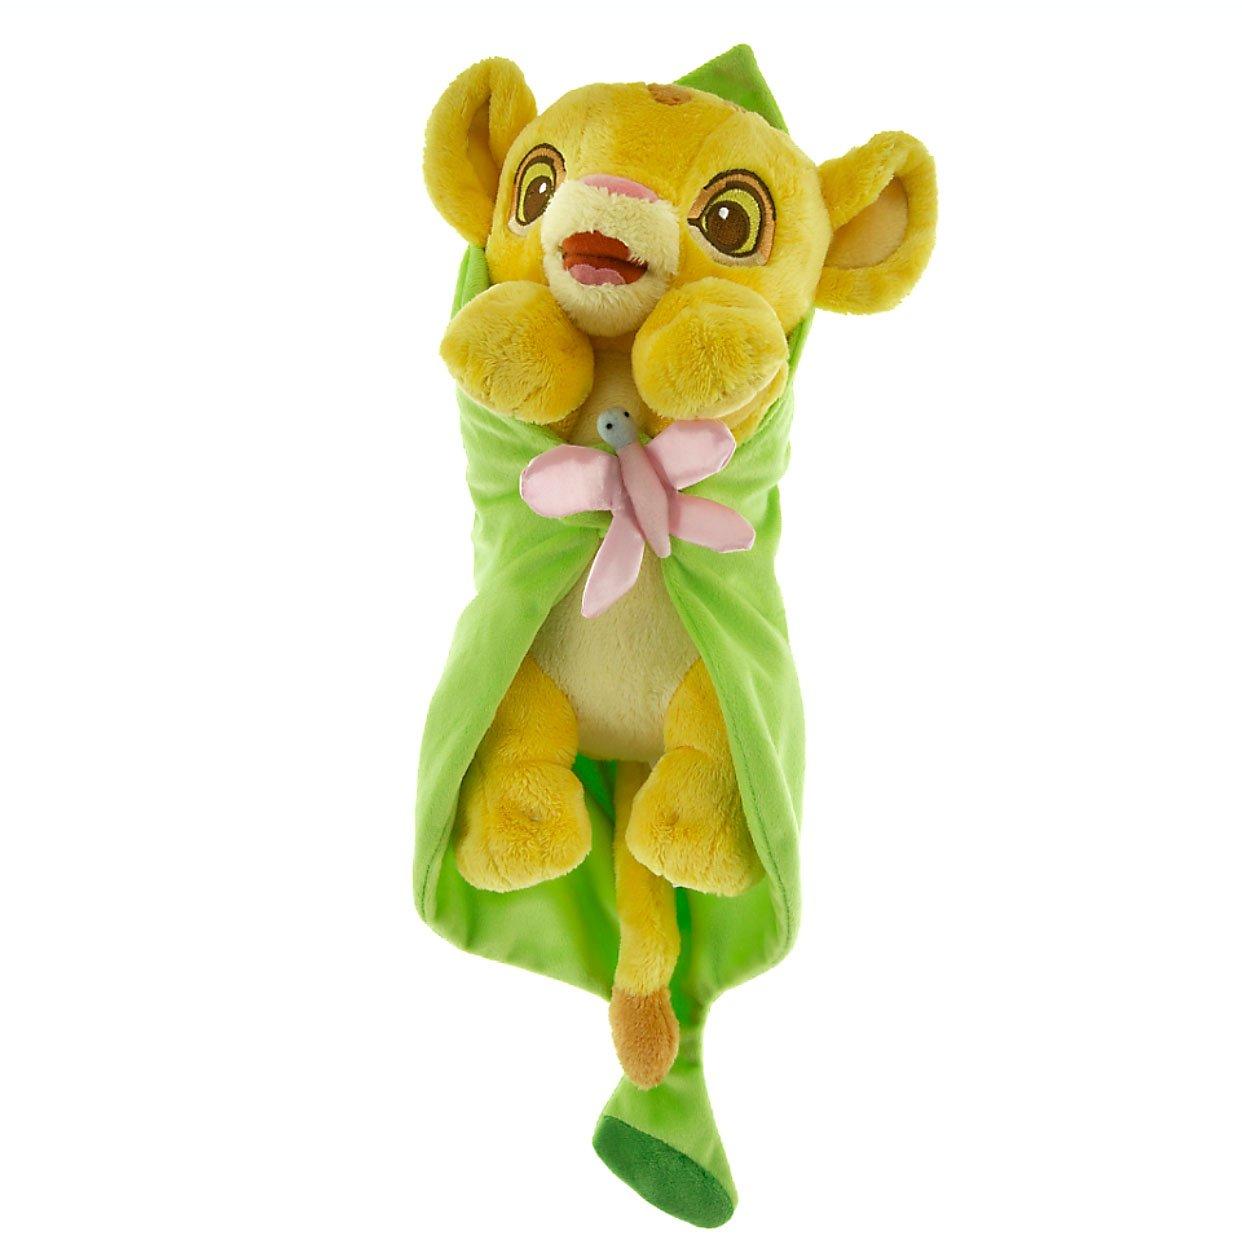 d44f31d6766f Amazon.com  Disney Parks Exclusive Lion King Baby Simba Babies ...